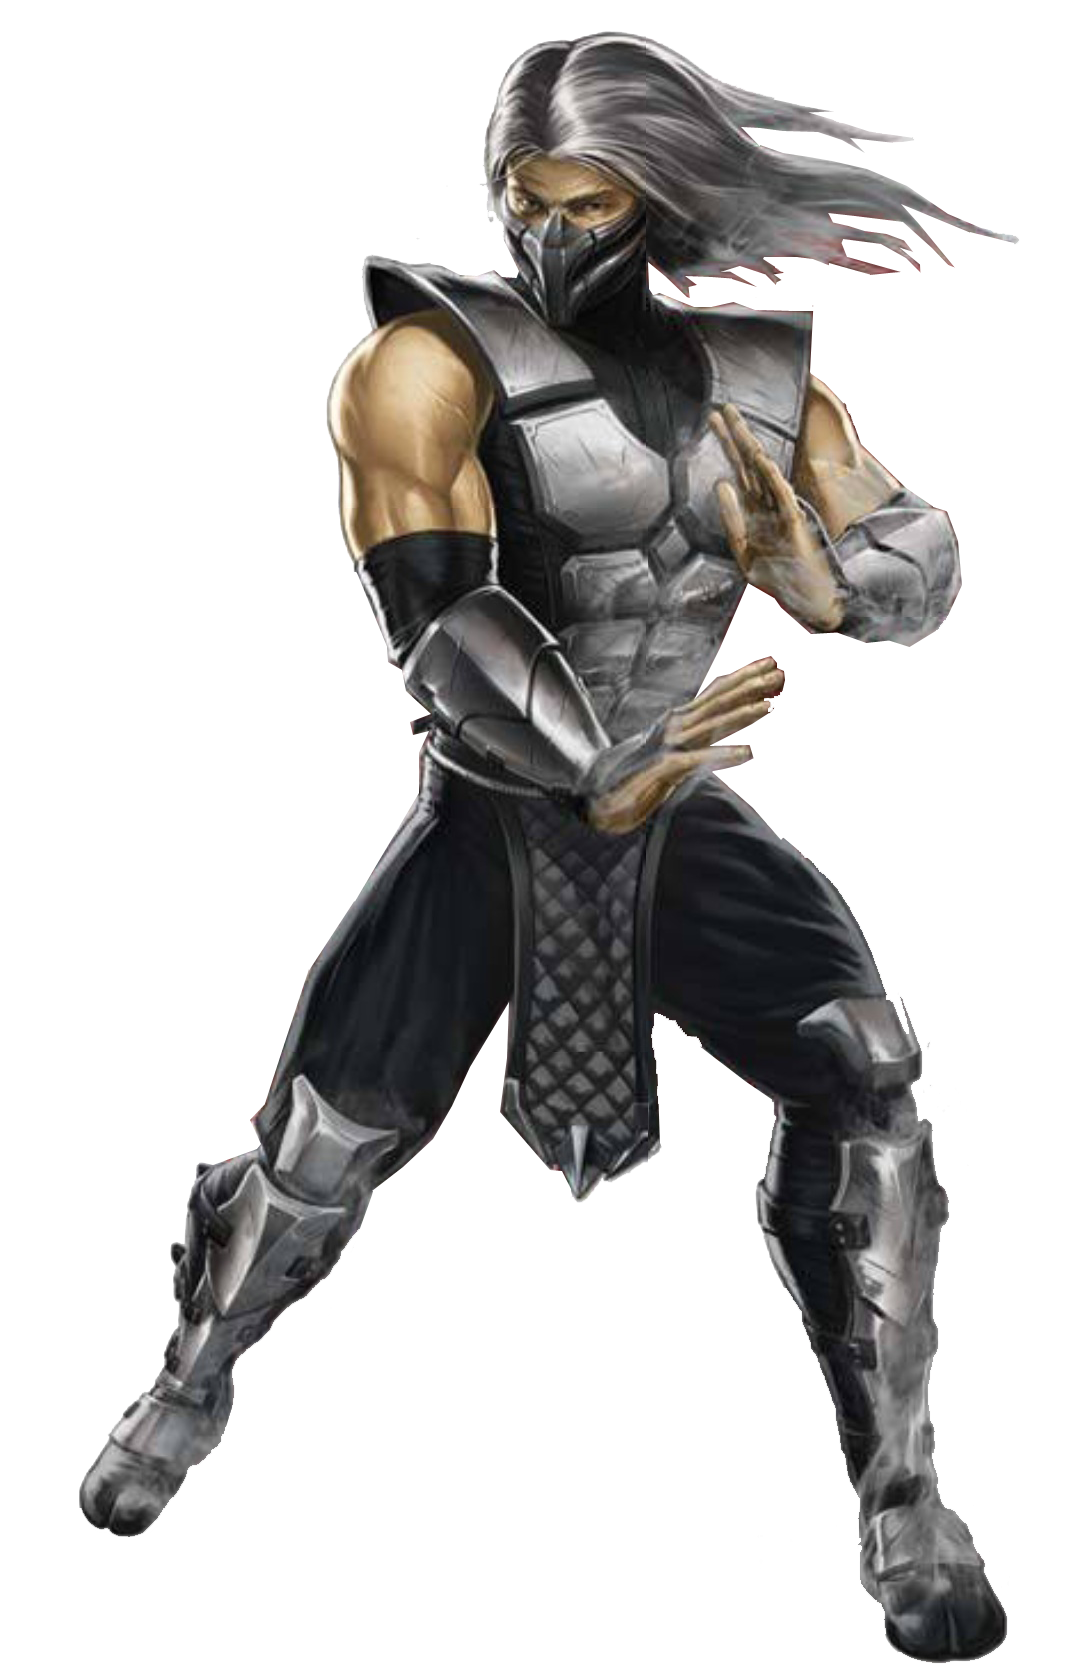 smoke mortal kombat wiki fandom powered by wikia - Mortal Kombat Smoke Halloween Costume